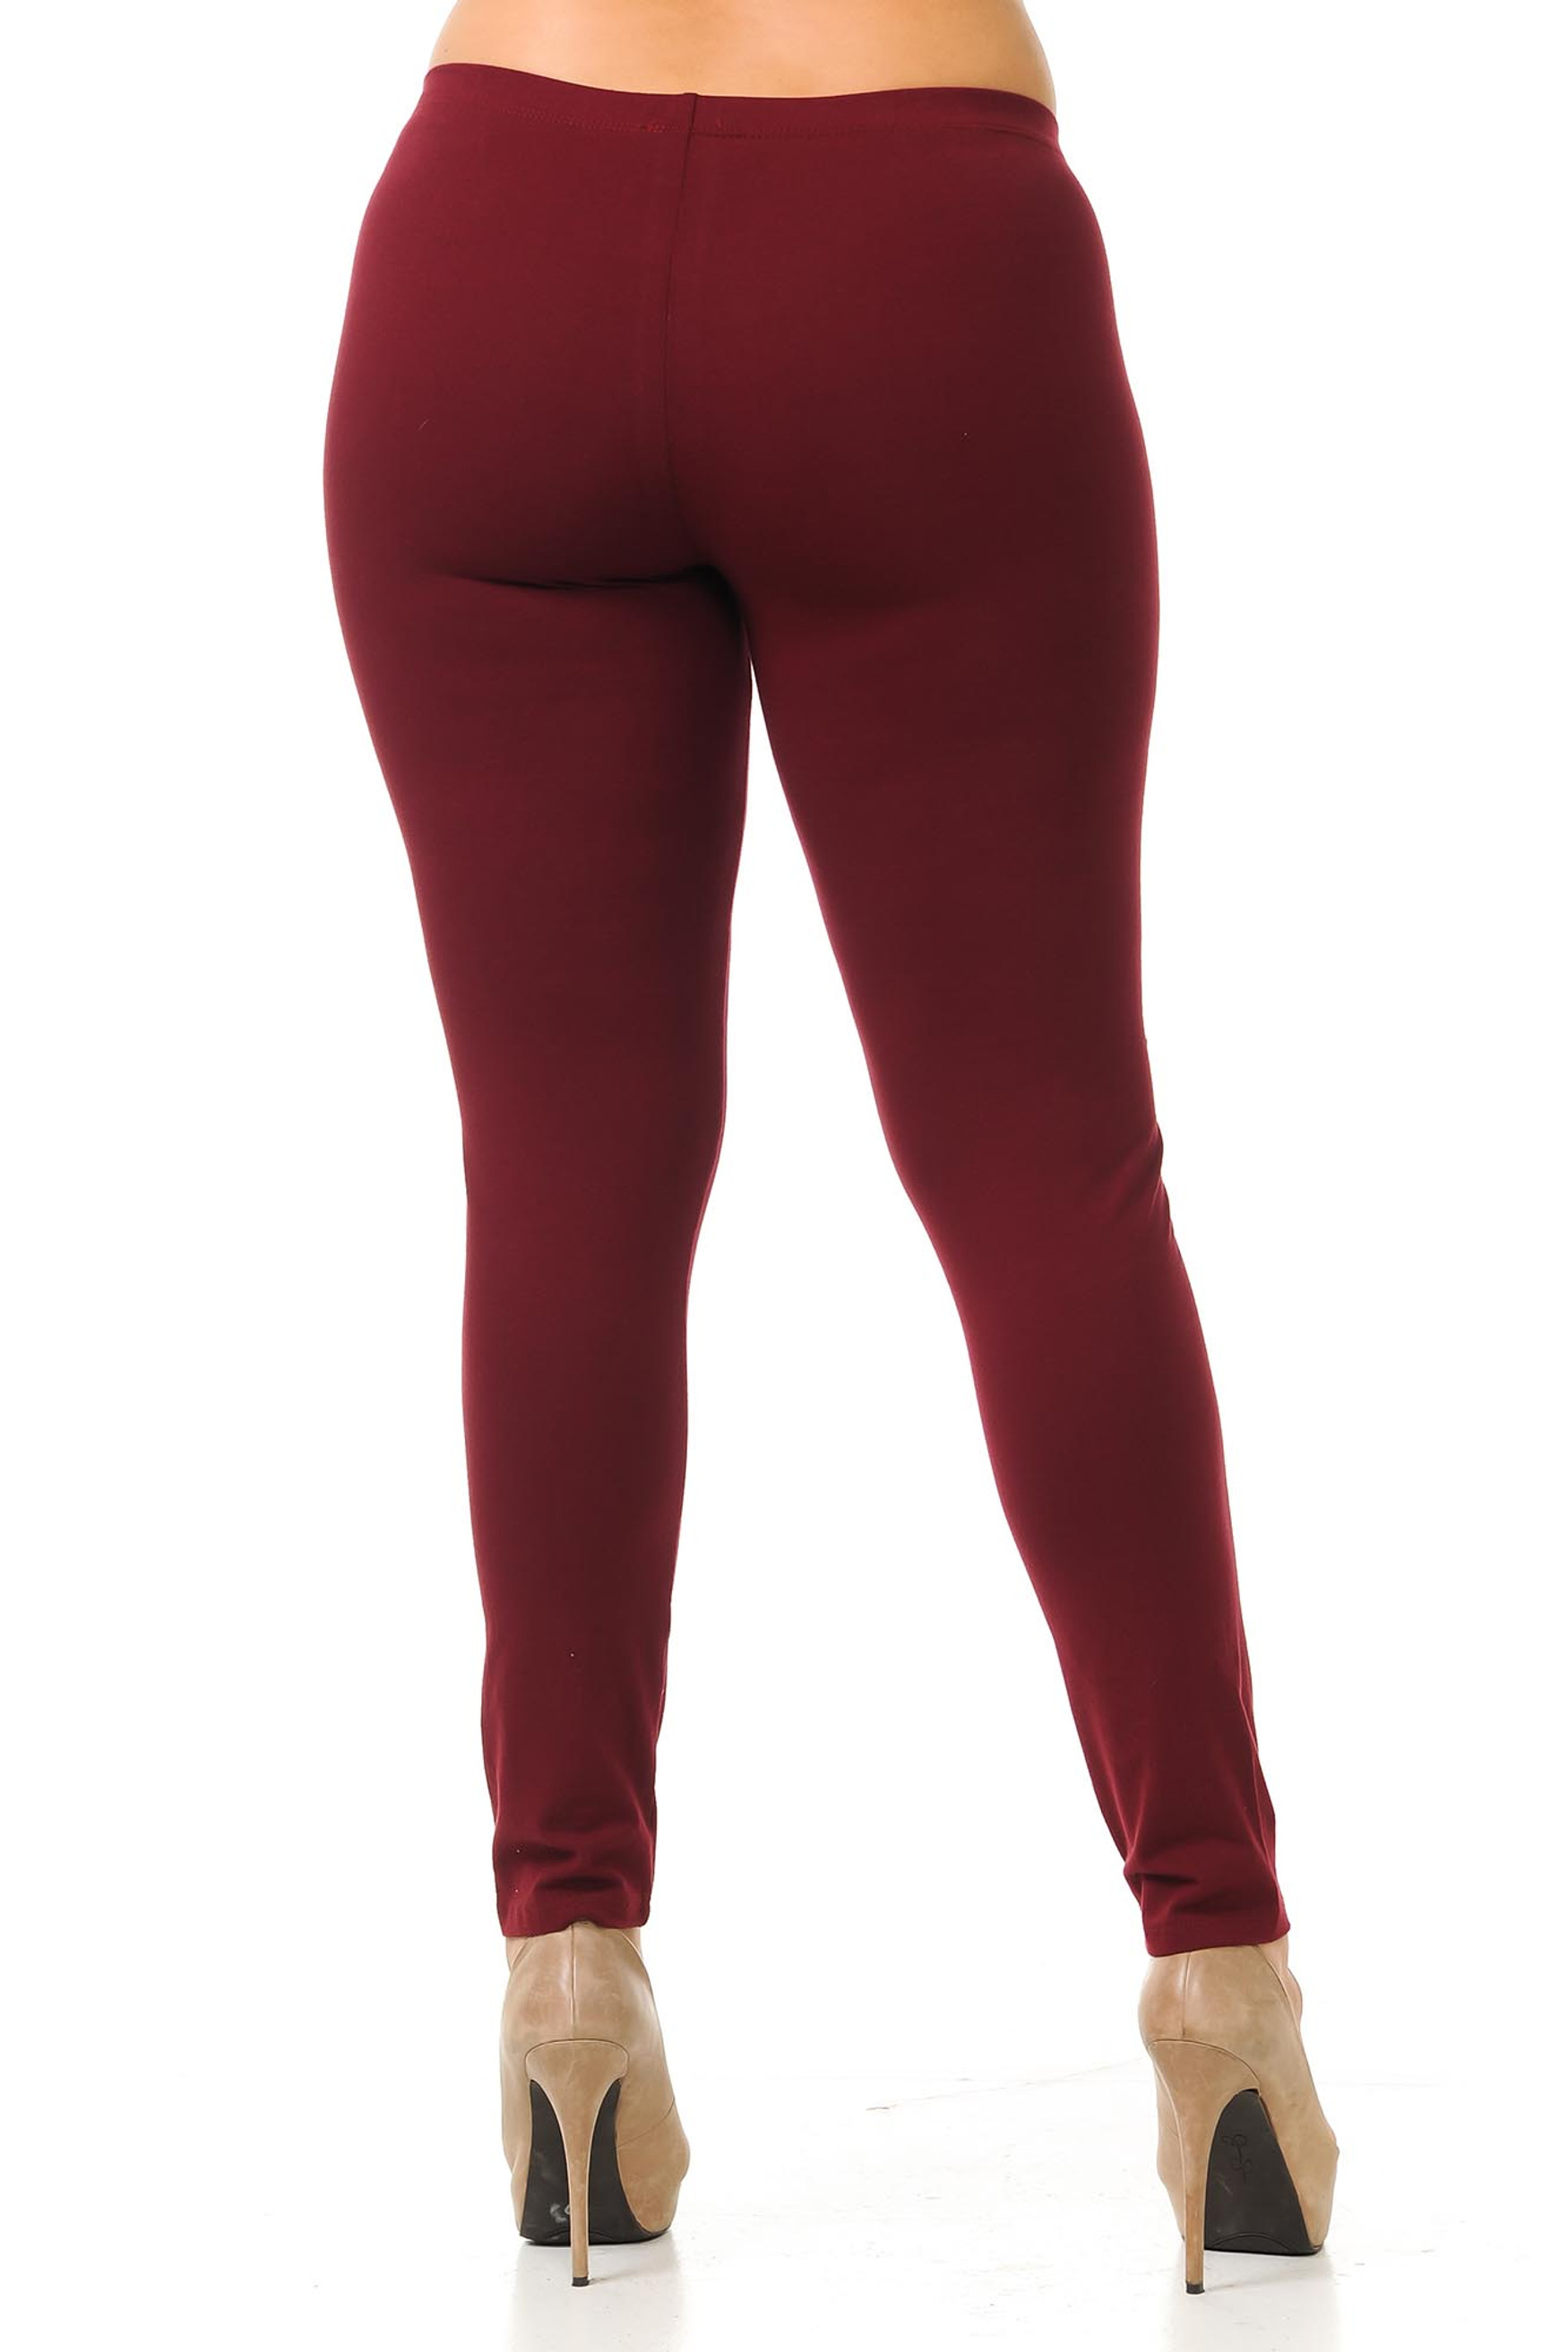 Rear view image of Burgundy USA Cotton Full Length Leggings - Plus Size